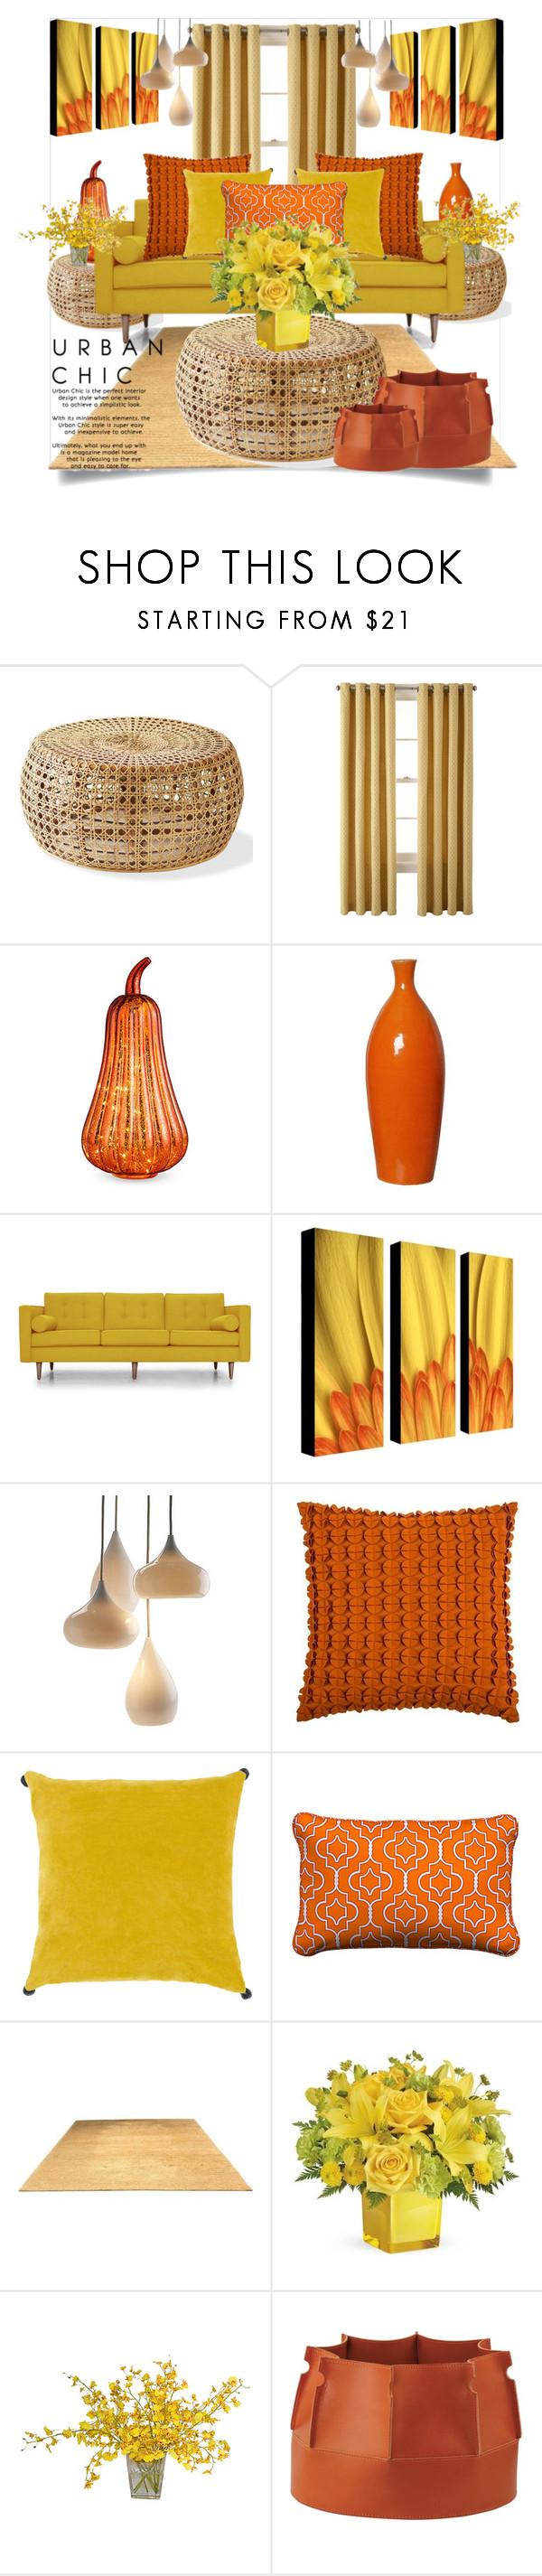 Urban Chic Interior Design | Chic interior design ...